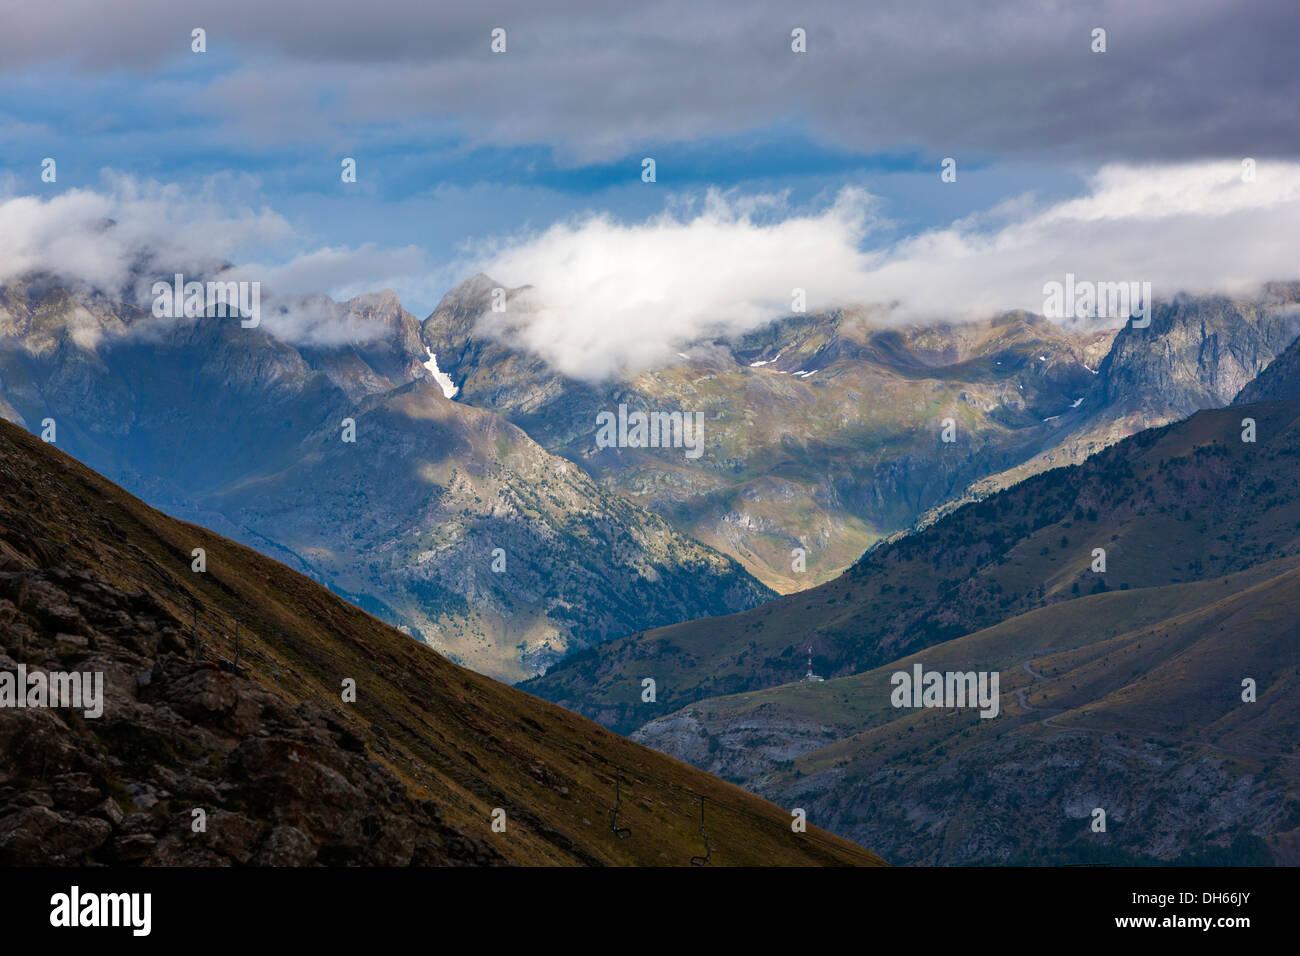 View from the ski area Panticosa over Valle de Tena, Puntal de los petros, Sierra de Tendeñera. Stock Photo